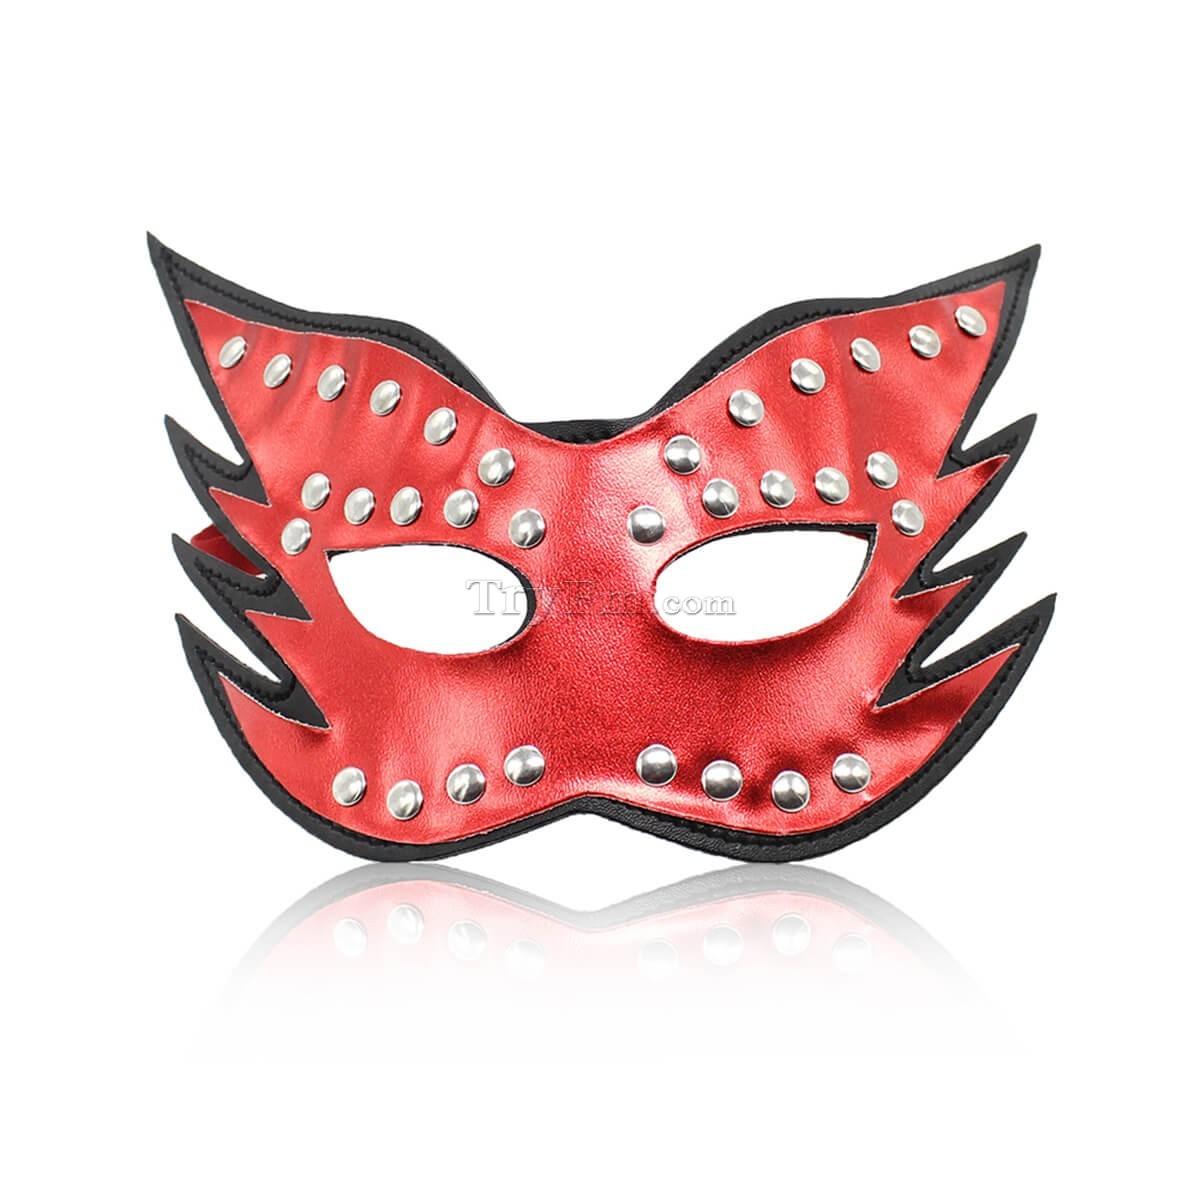 4-animal-eye-mask9.jpg